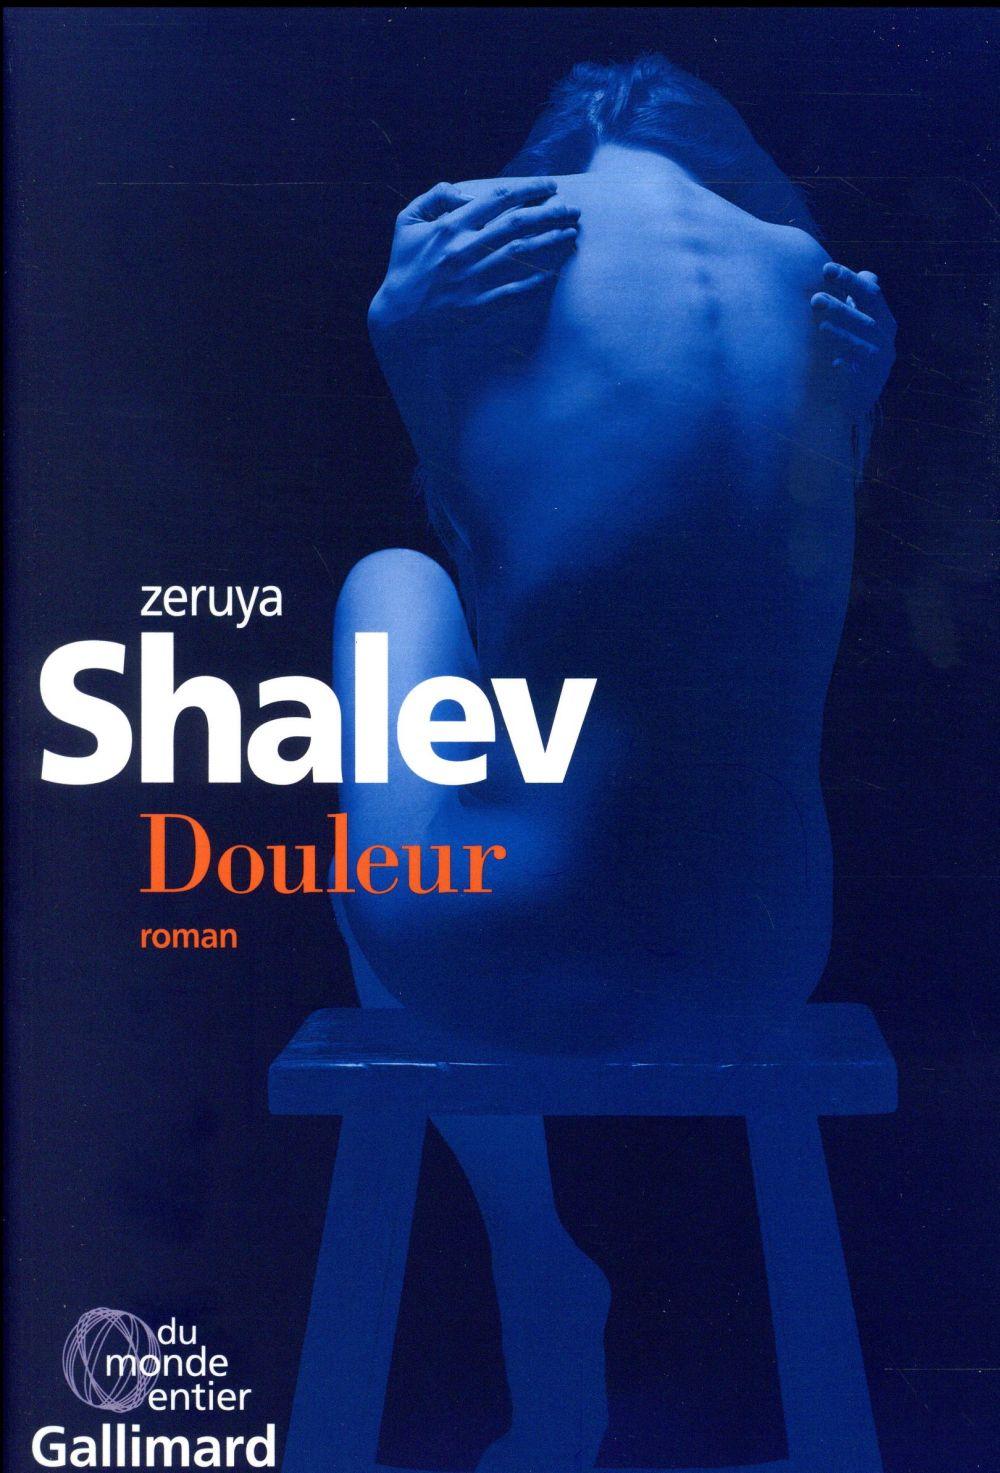 DOULEUR SHALEV ZERUYA Gallimard